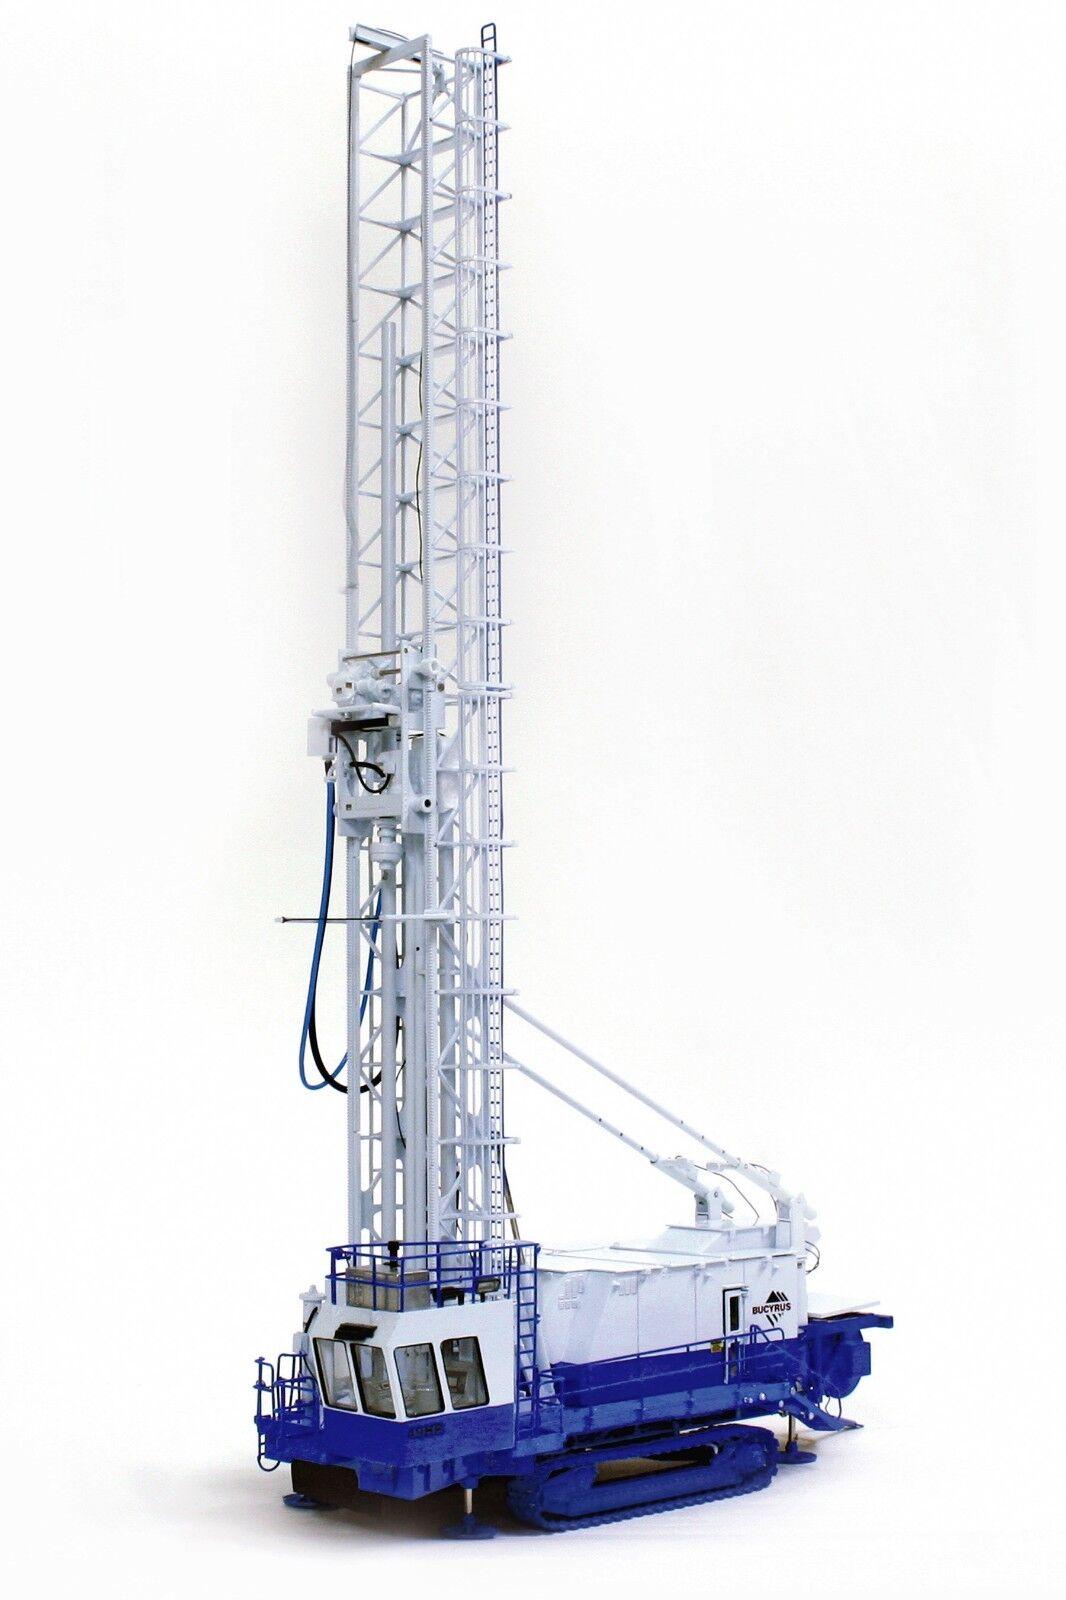 Felice shopping Bucyrus 49HR  Drill Drill Drill Rig -  blu & bianca  - 1 50 - TWH  022-01022  prezzo all'ingrosso